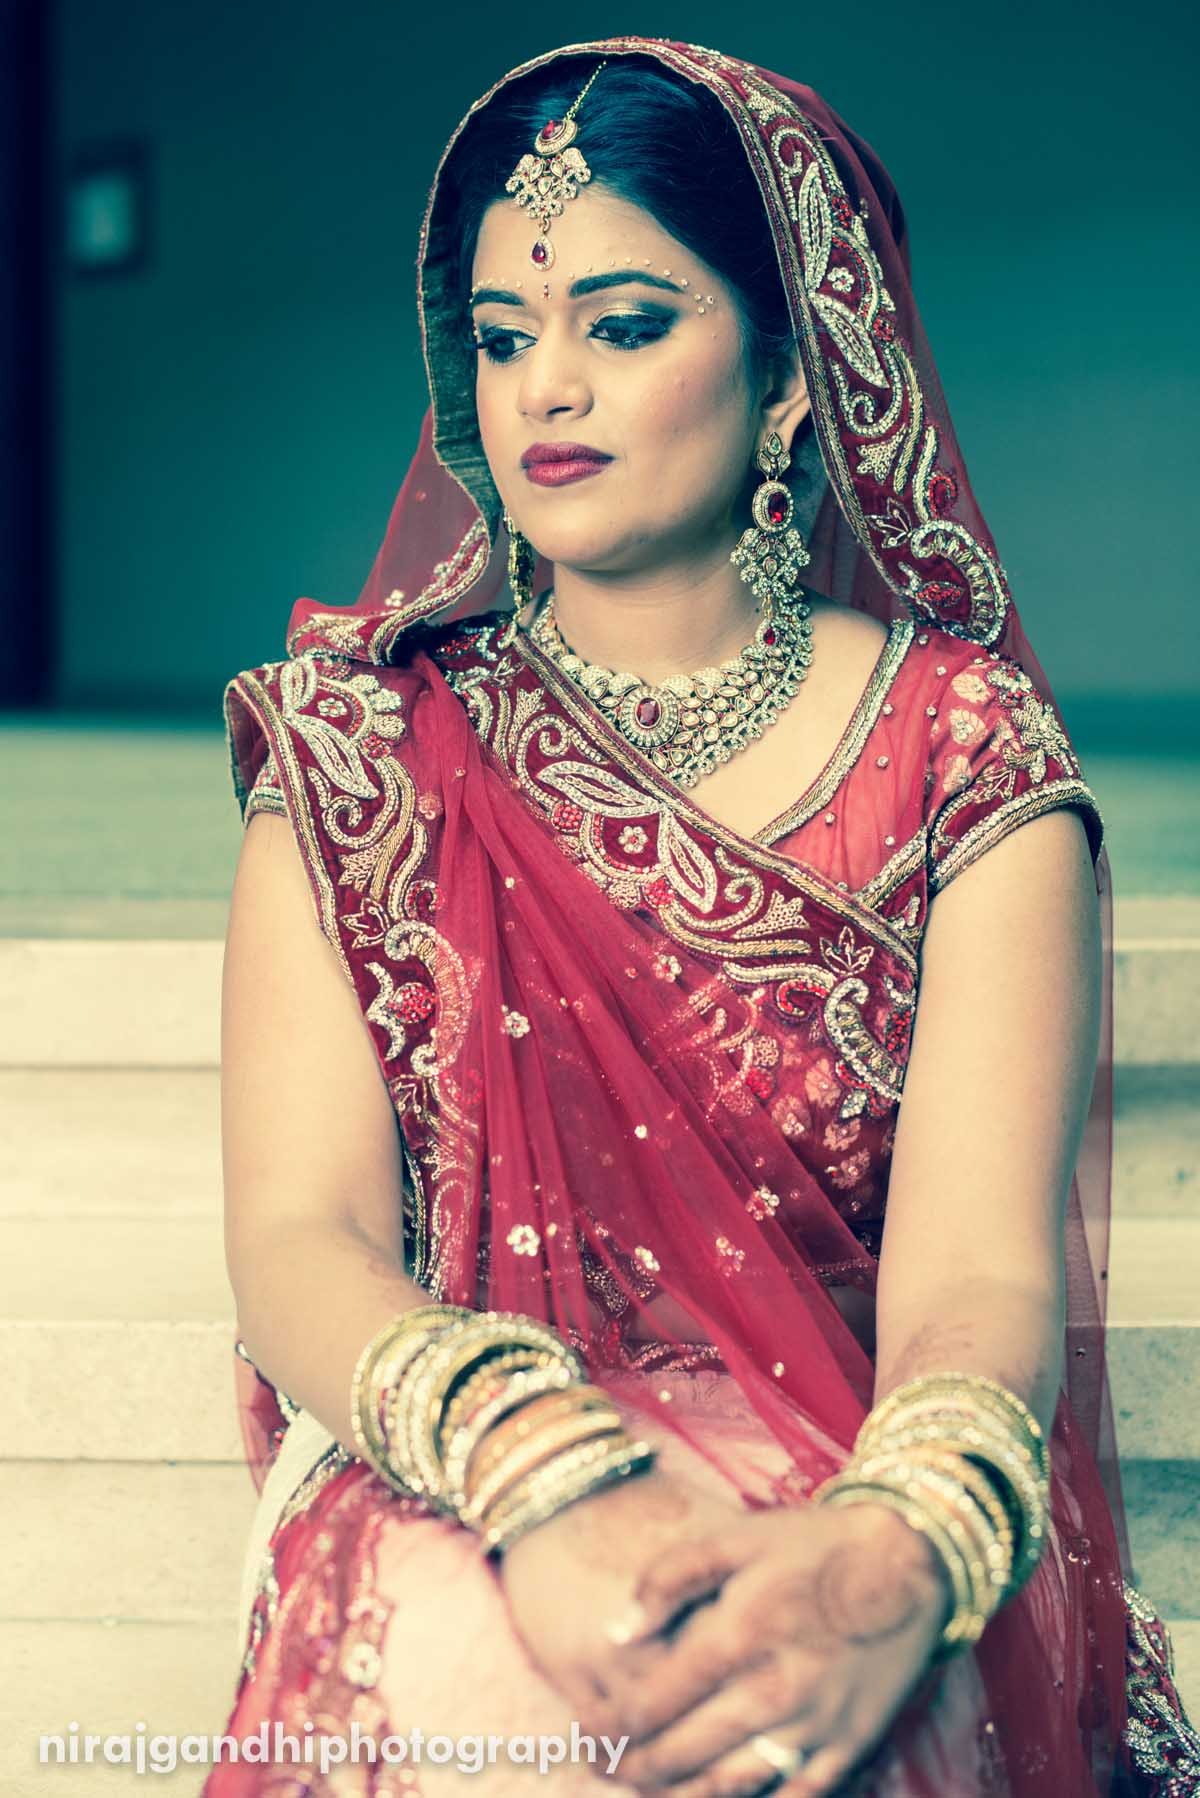 Uma + Chirag's Wedding-8.jpg